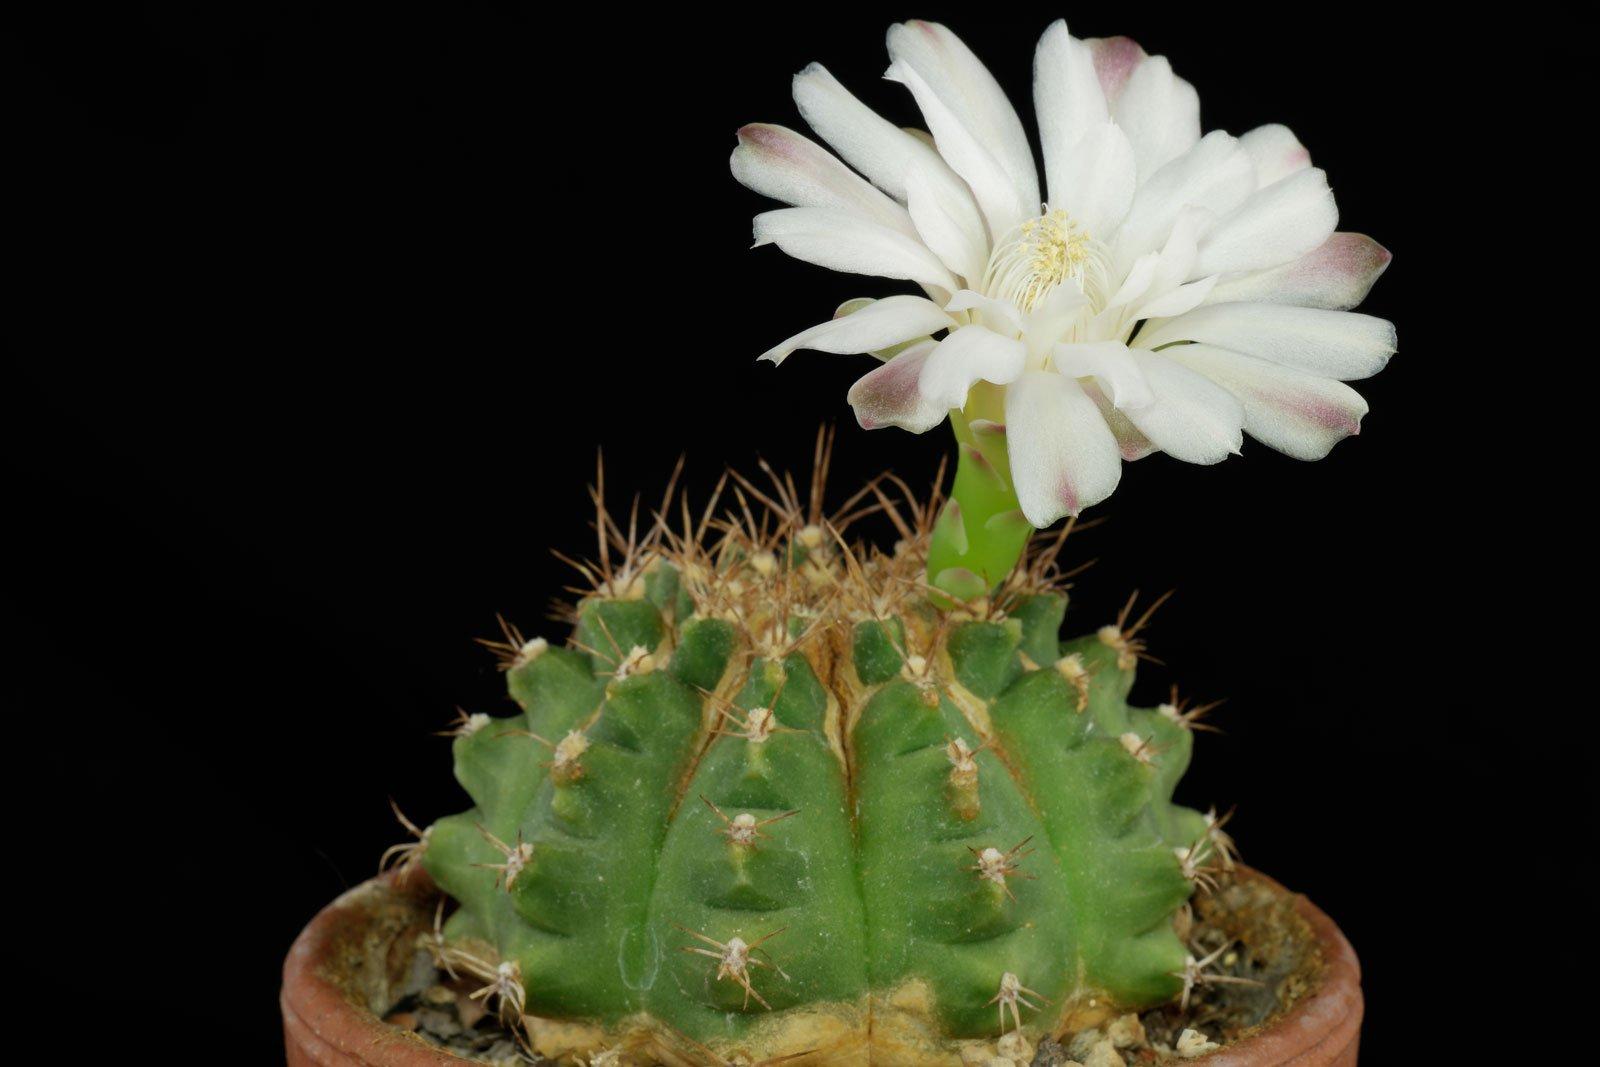 Gymnocalycium anisitsii ssp. anisitsii